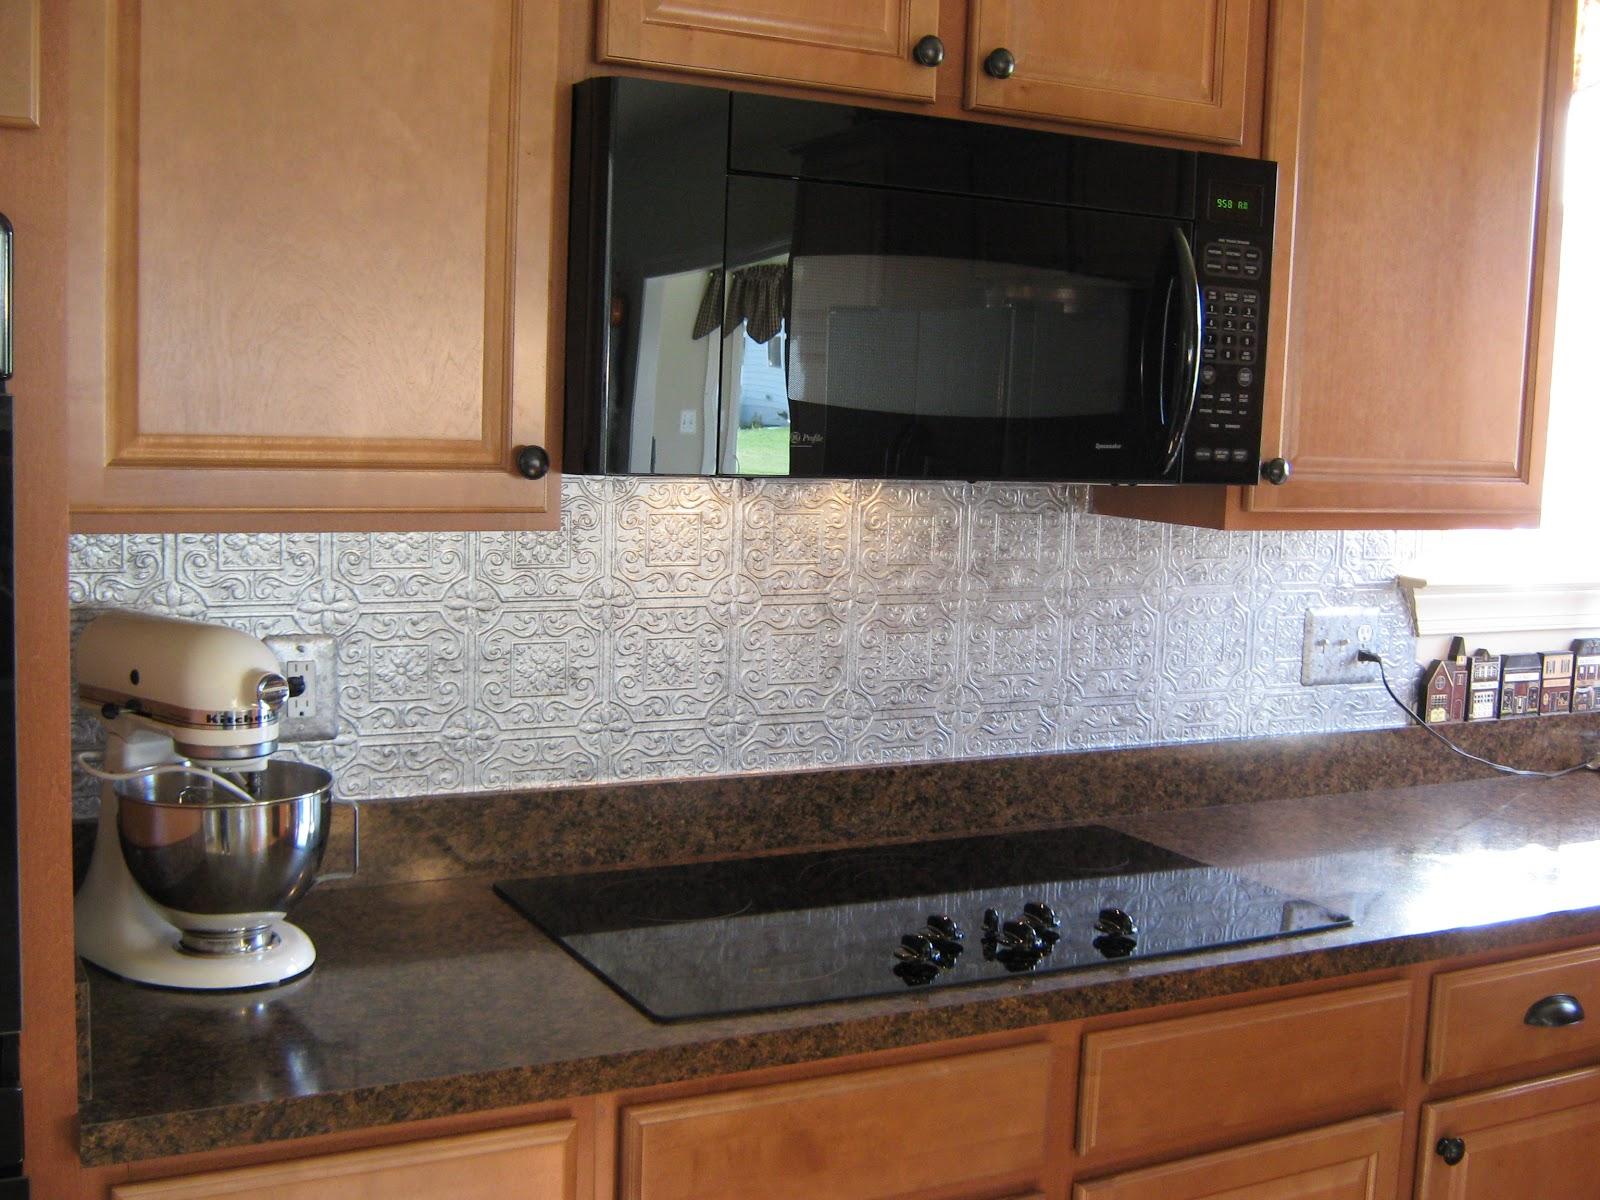 Textured Wallpaper For Kitchen Backsplash